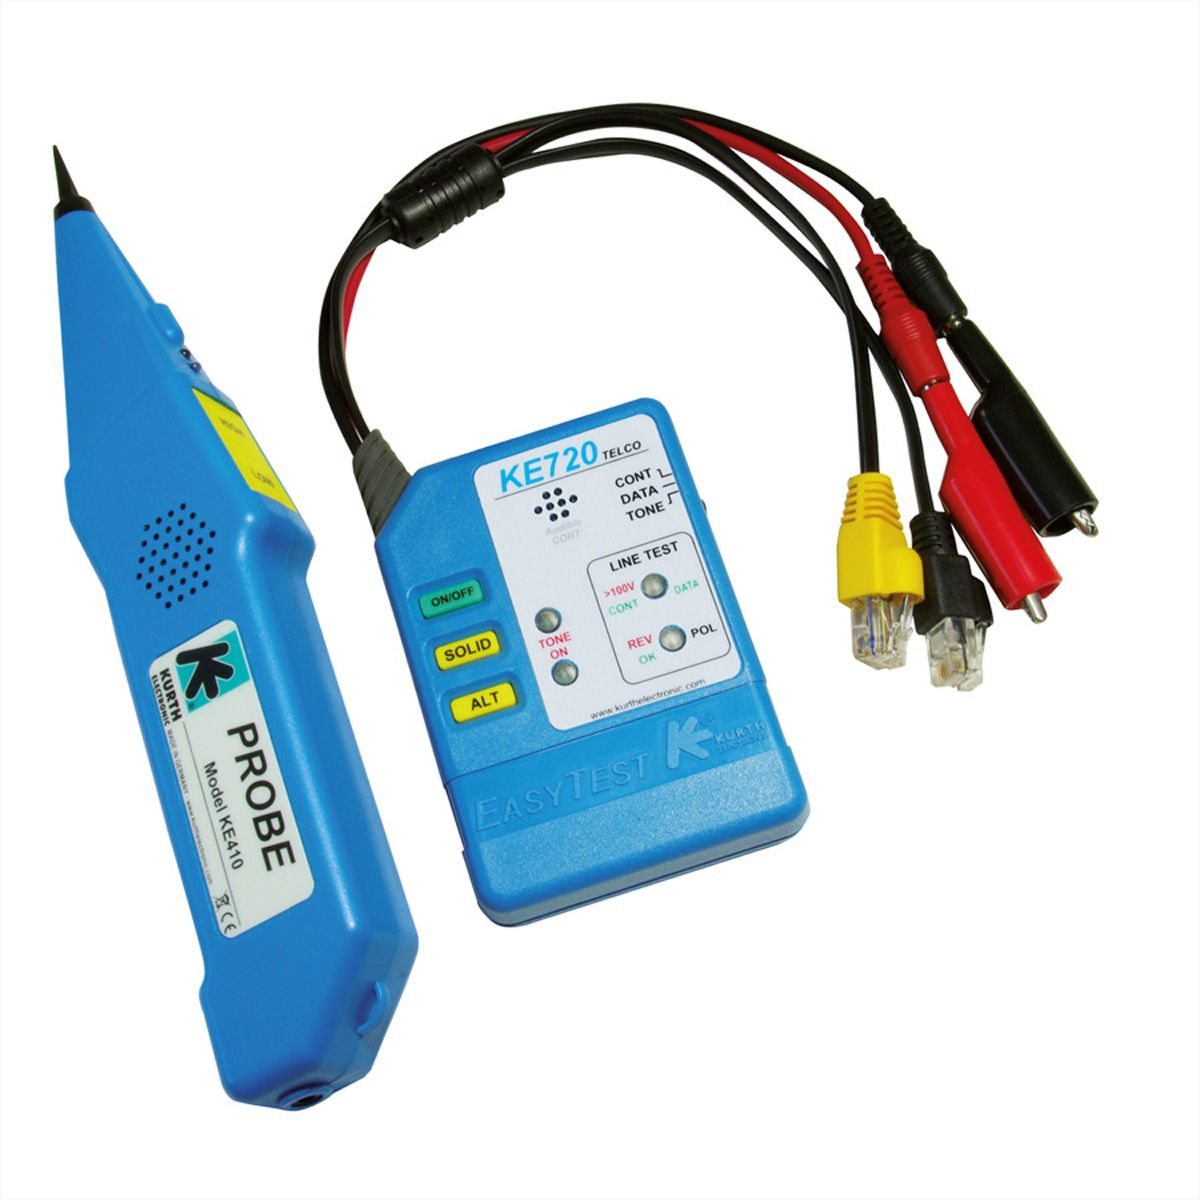 kurth ke701 kit chercheur de câbles - easytest720 et probe410